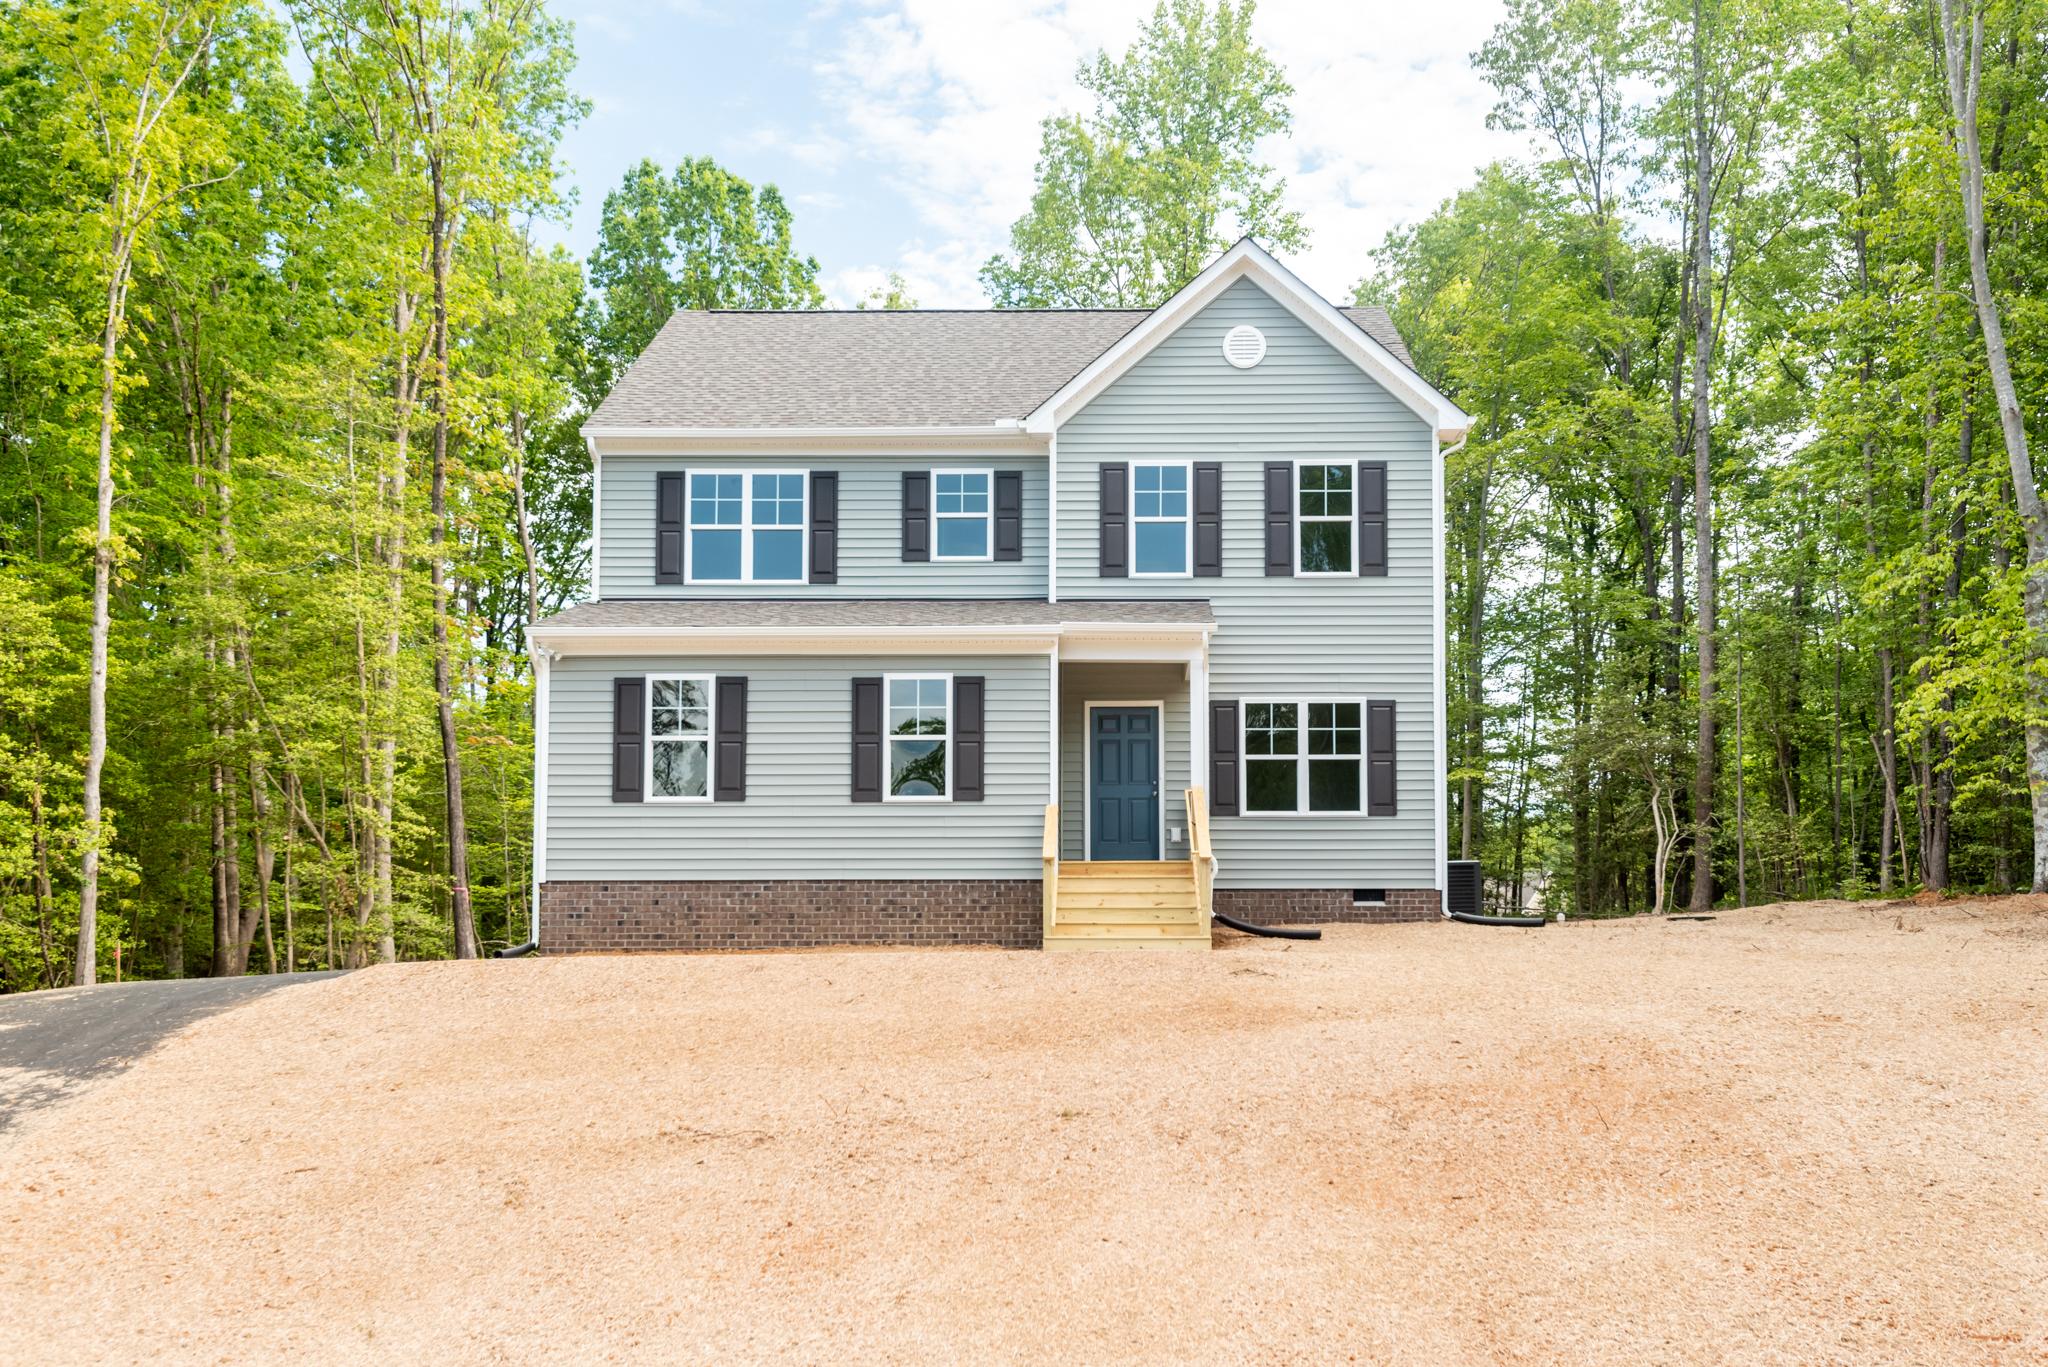 Virginia real estate Photographer-_DSC6481